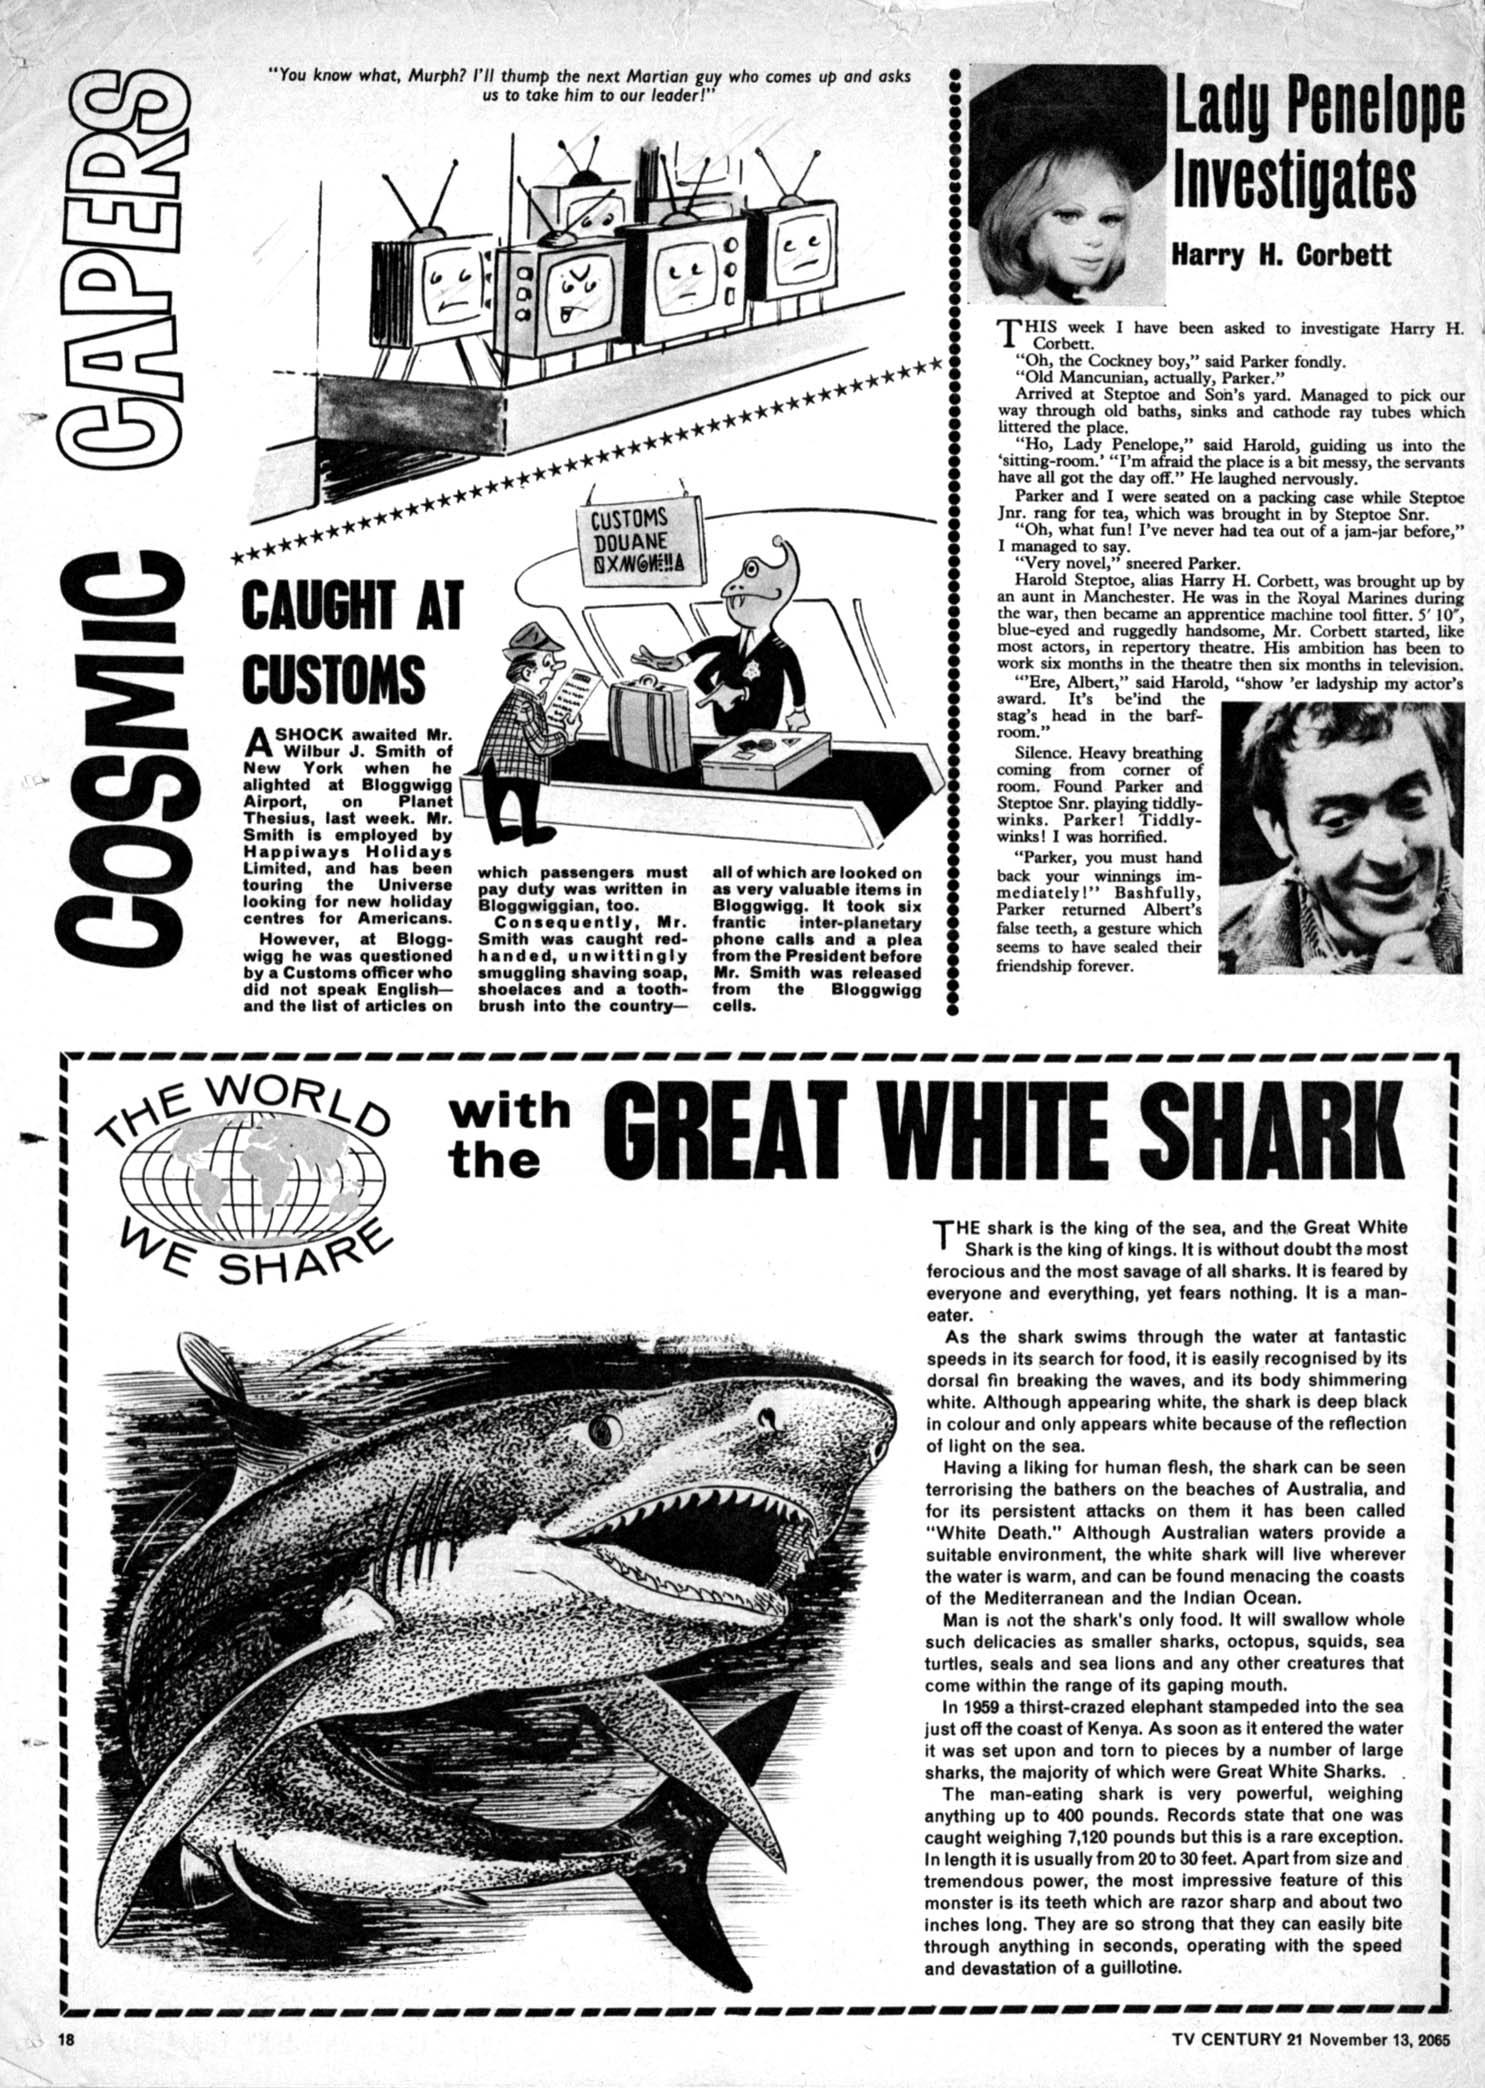 Read online TV Century 21 (TV 21) comic -  Issue #43 - 17